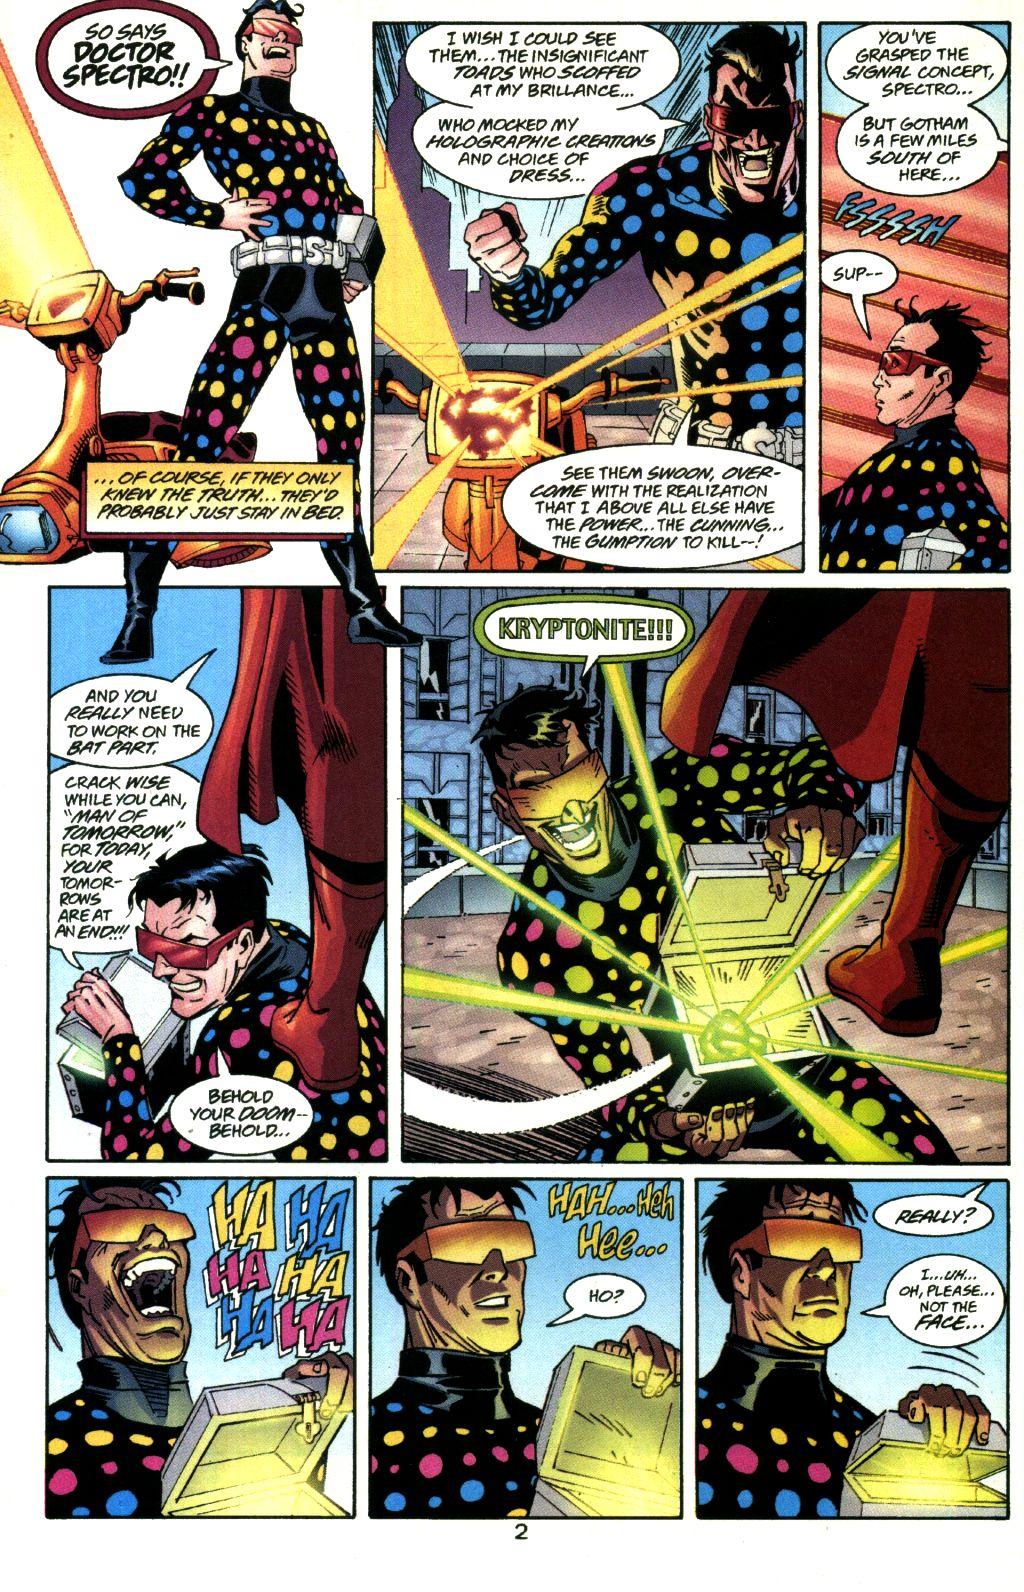 Action Comics (1938) 760 Page 2